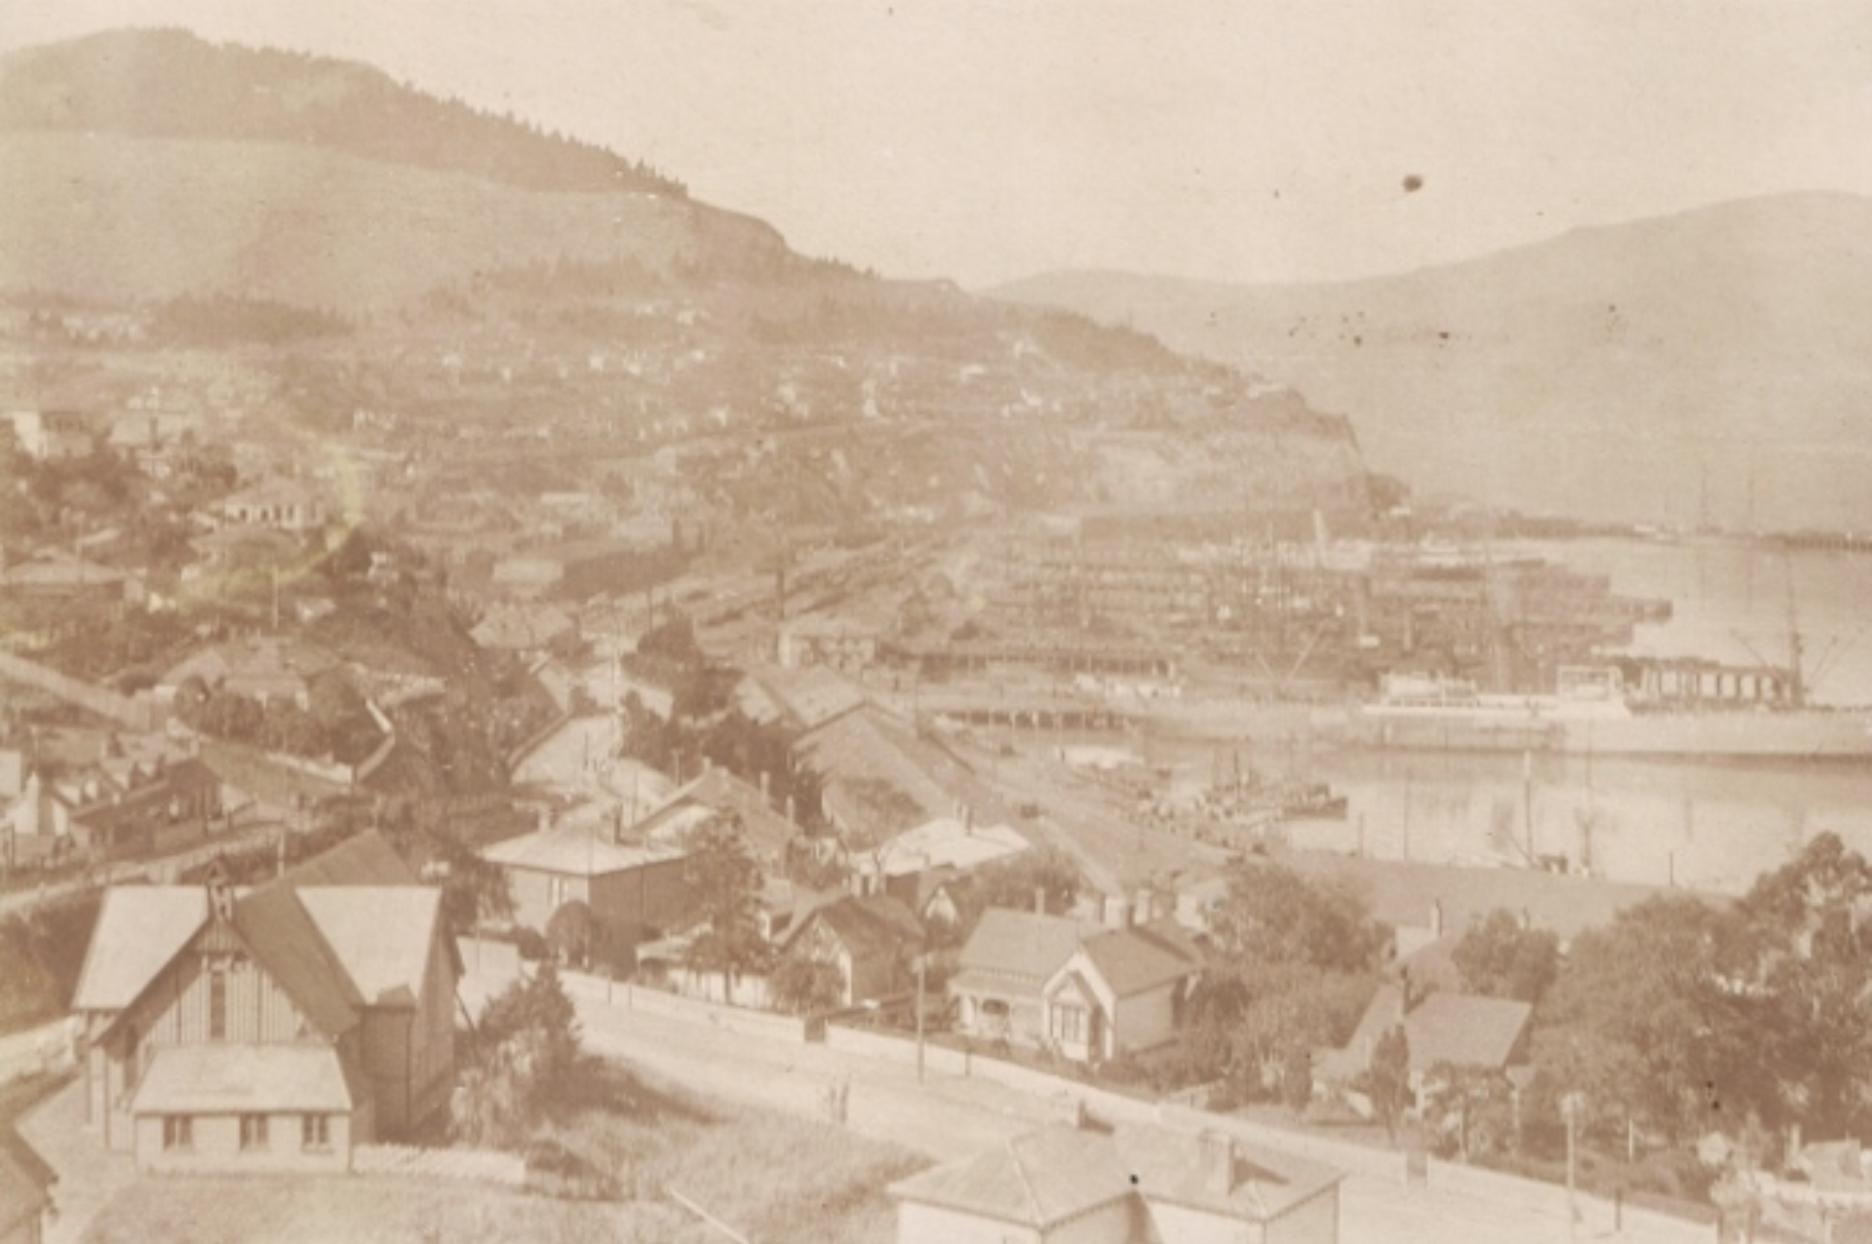 St Saviour's Church (bottom left) in West Lyttelton, c.a. 1911. Lyttelton Museum.